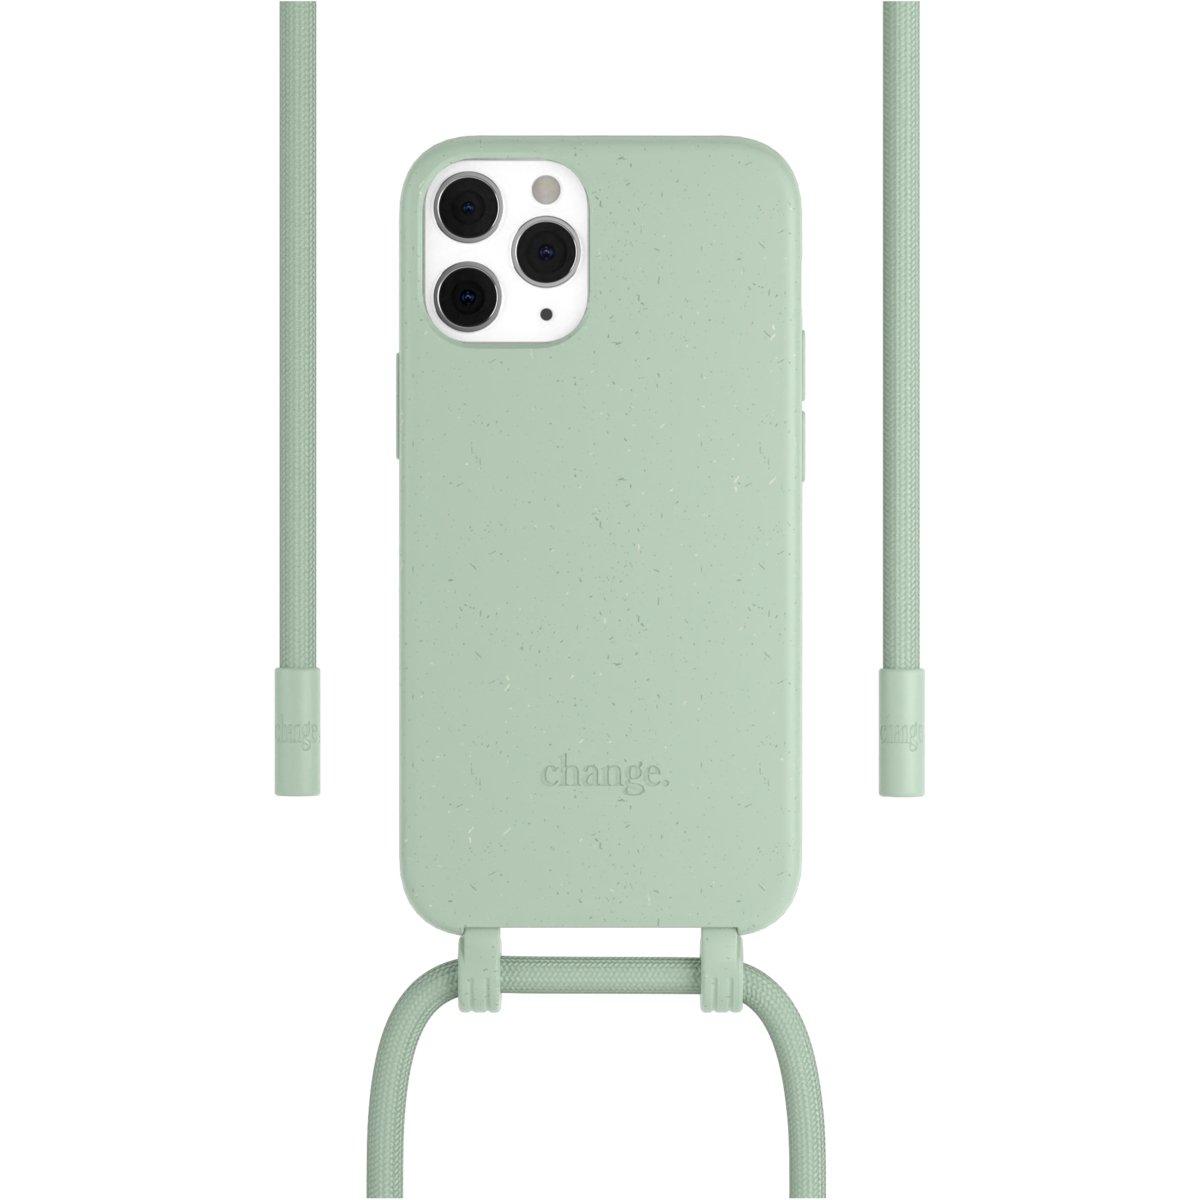 Woodcessories Change Case AM iPhone 12 / 12 Pro - mint